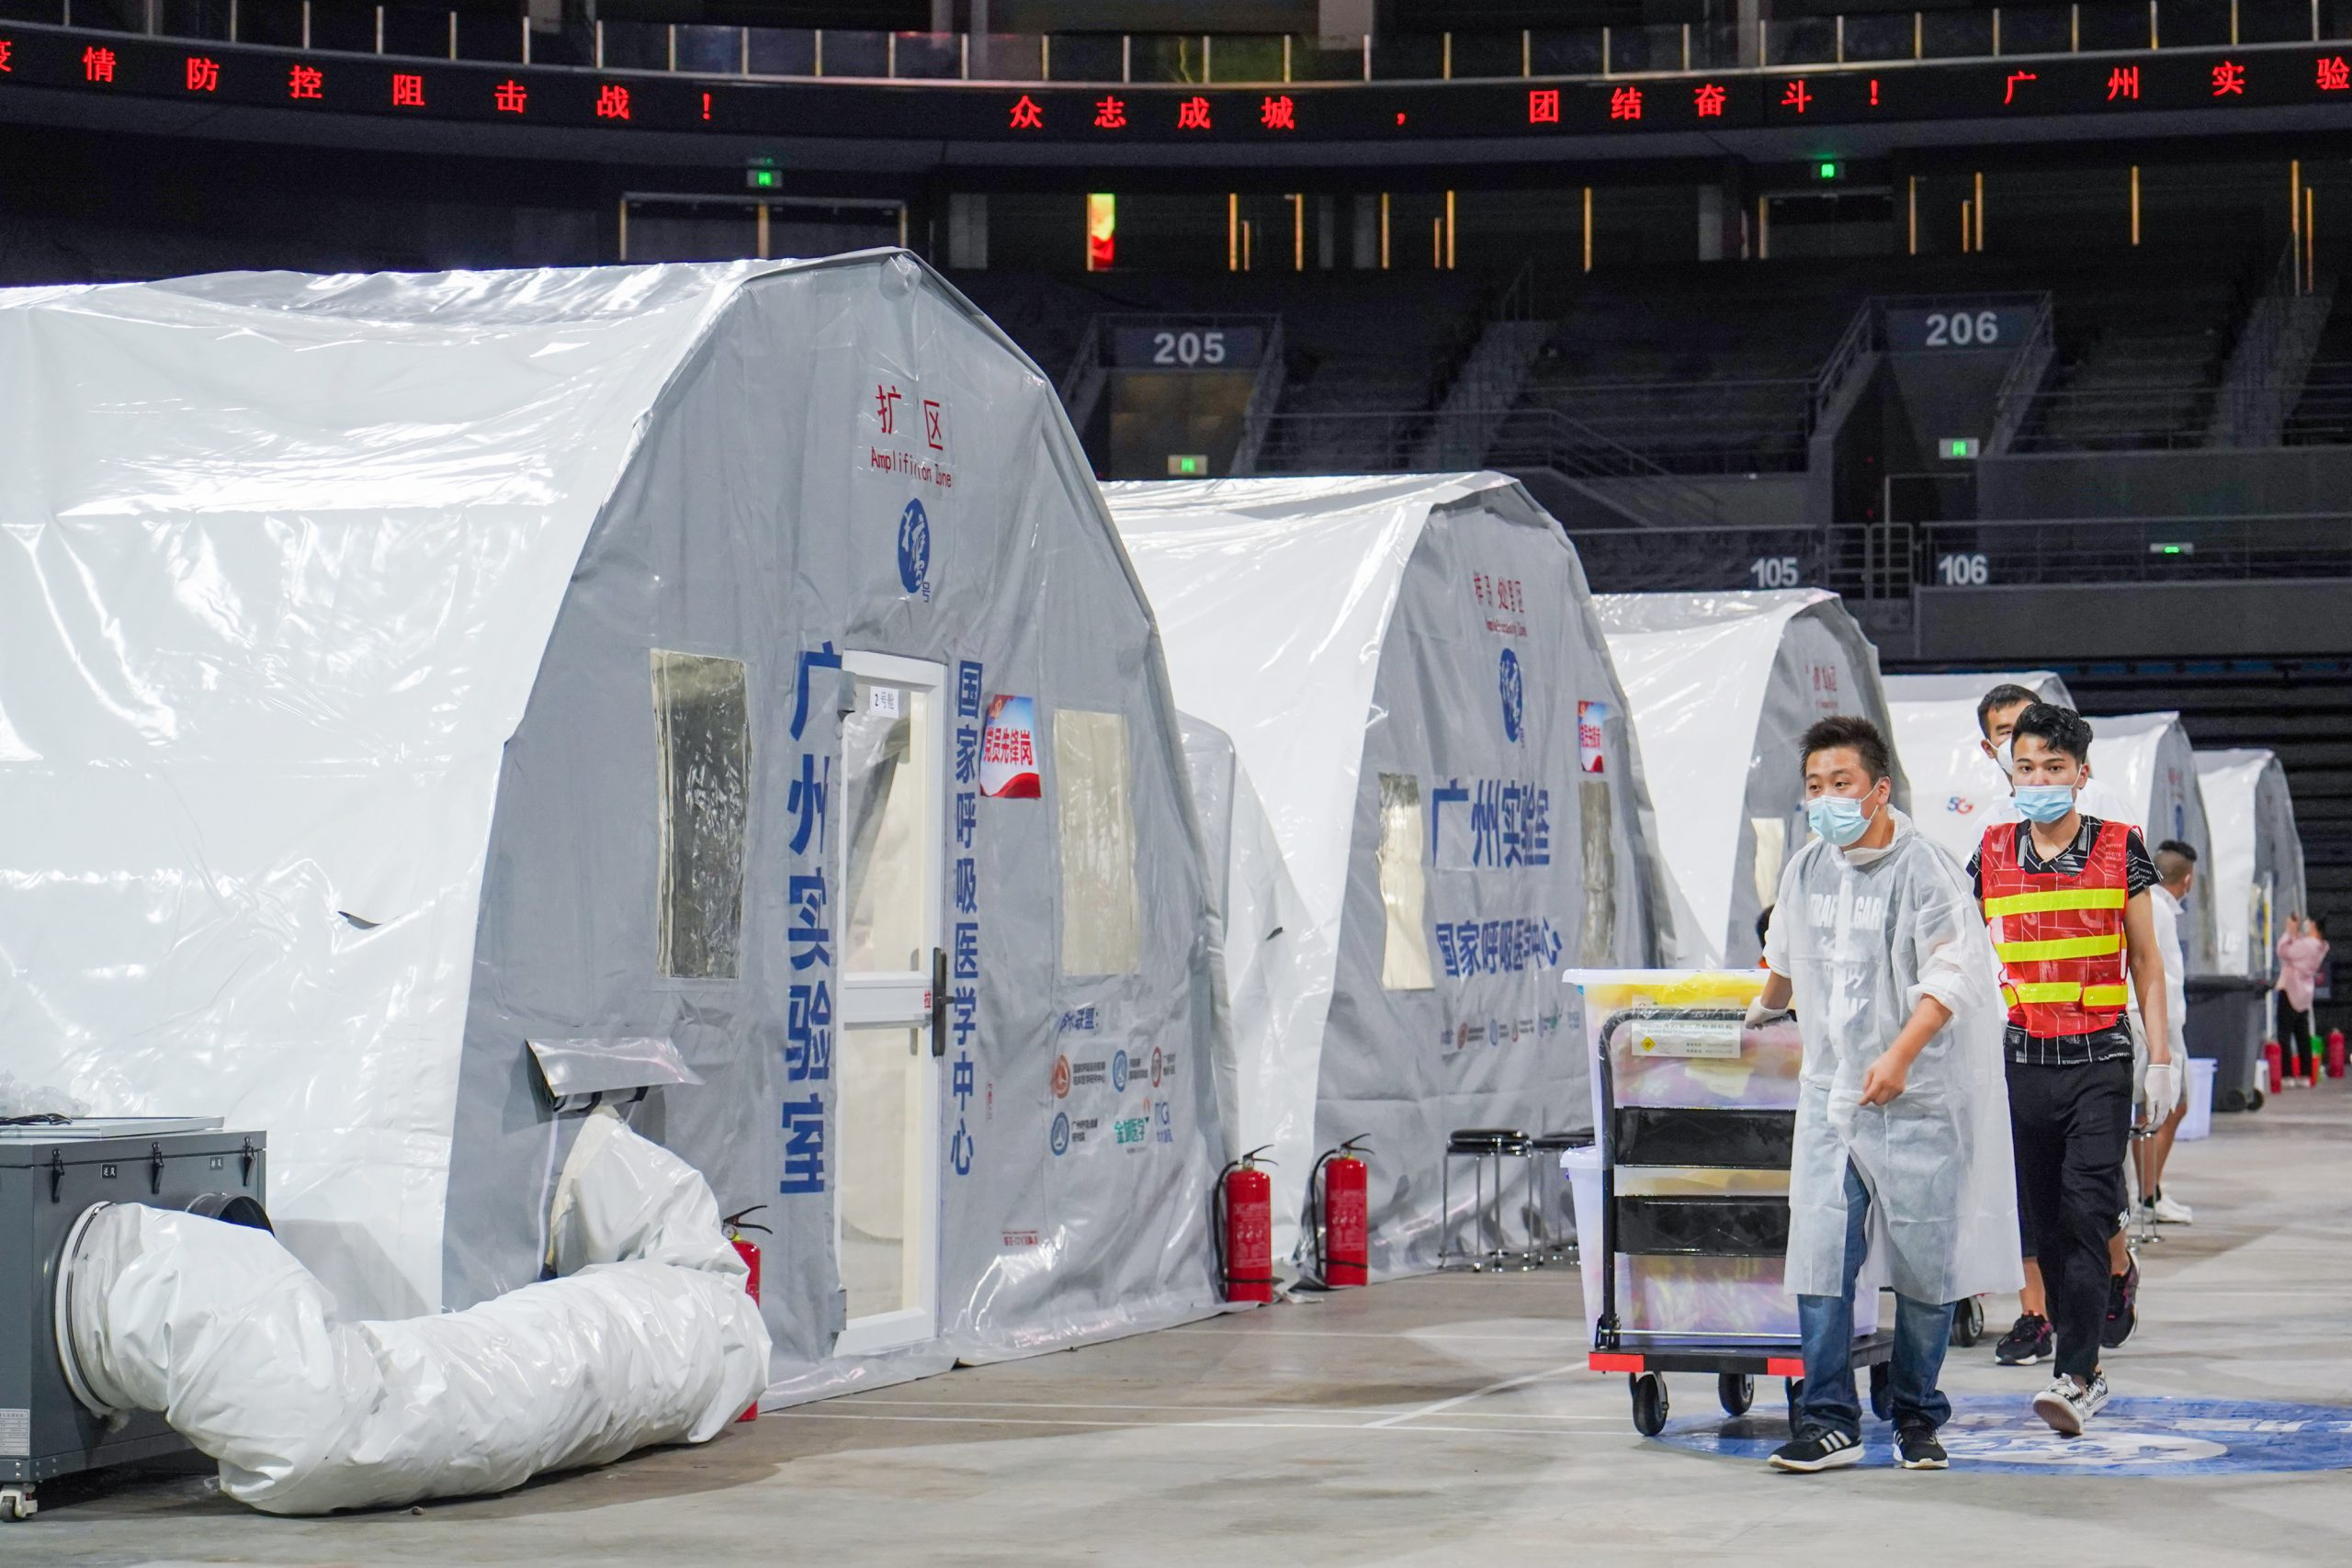 Ciudad china de Nanjing agrega seis áreas de riesgo medio por COVID-19